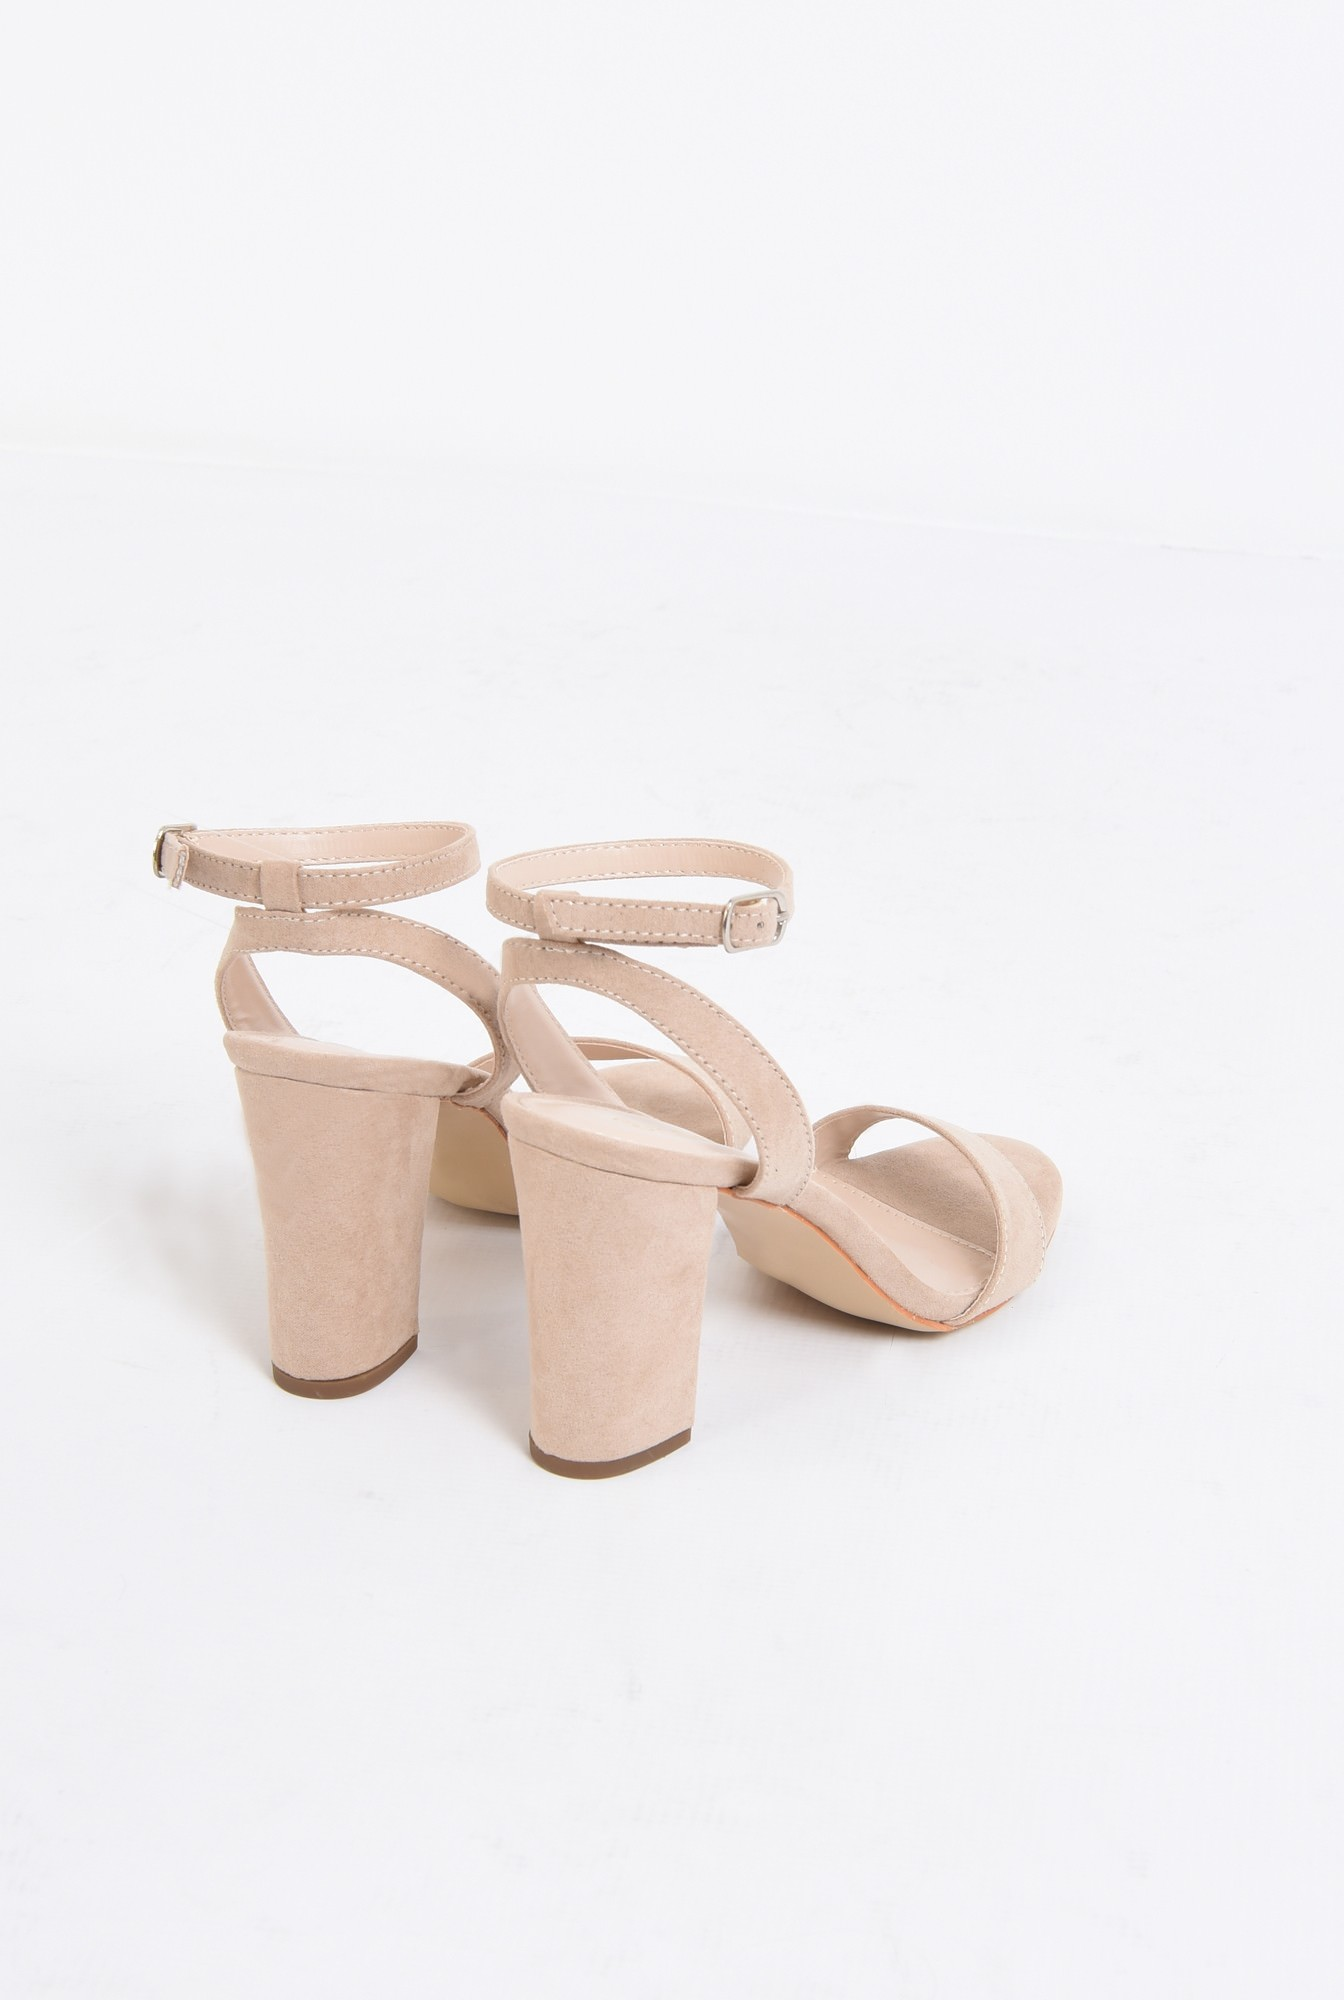 2 - sandale elegante, crem, toc gros, piele intoarsa eco